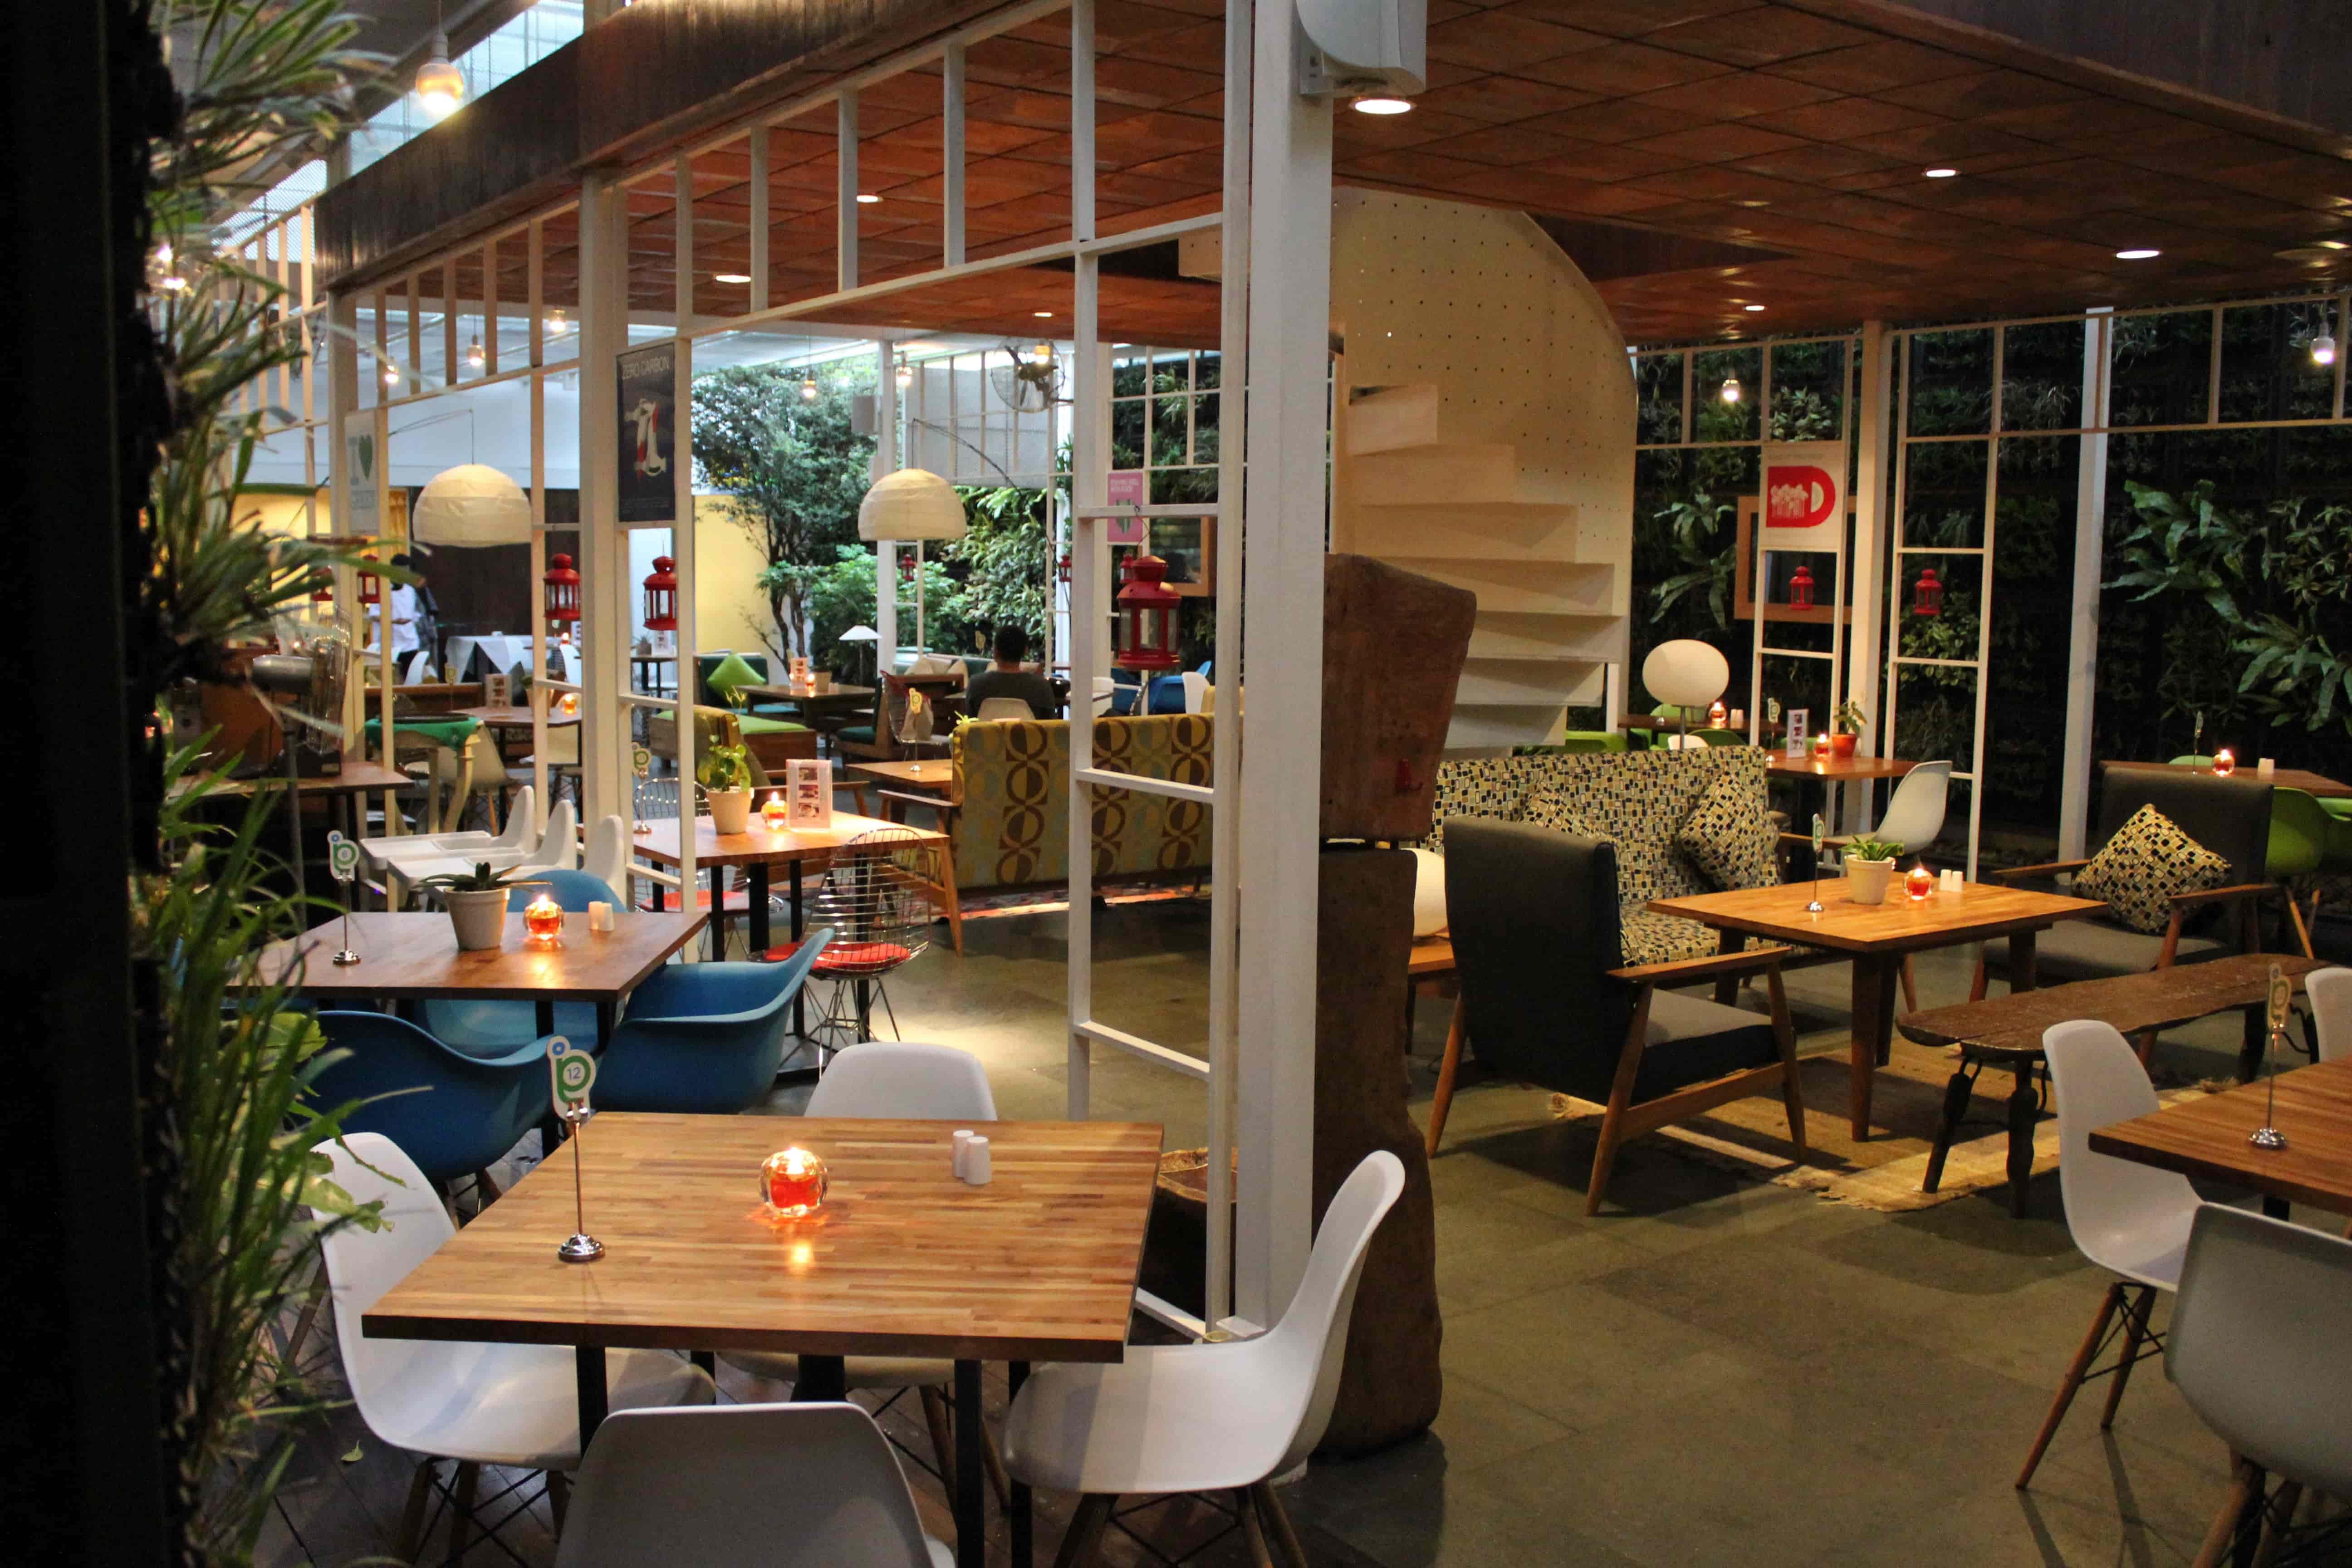 The Best Restaurants In Stoke Newington